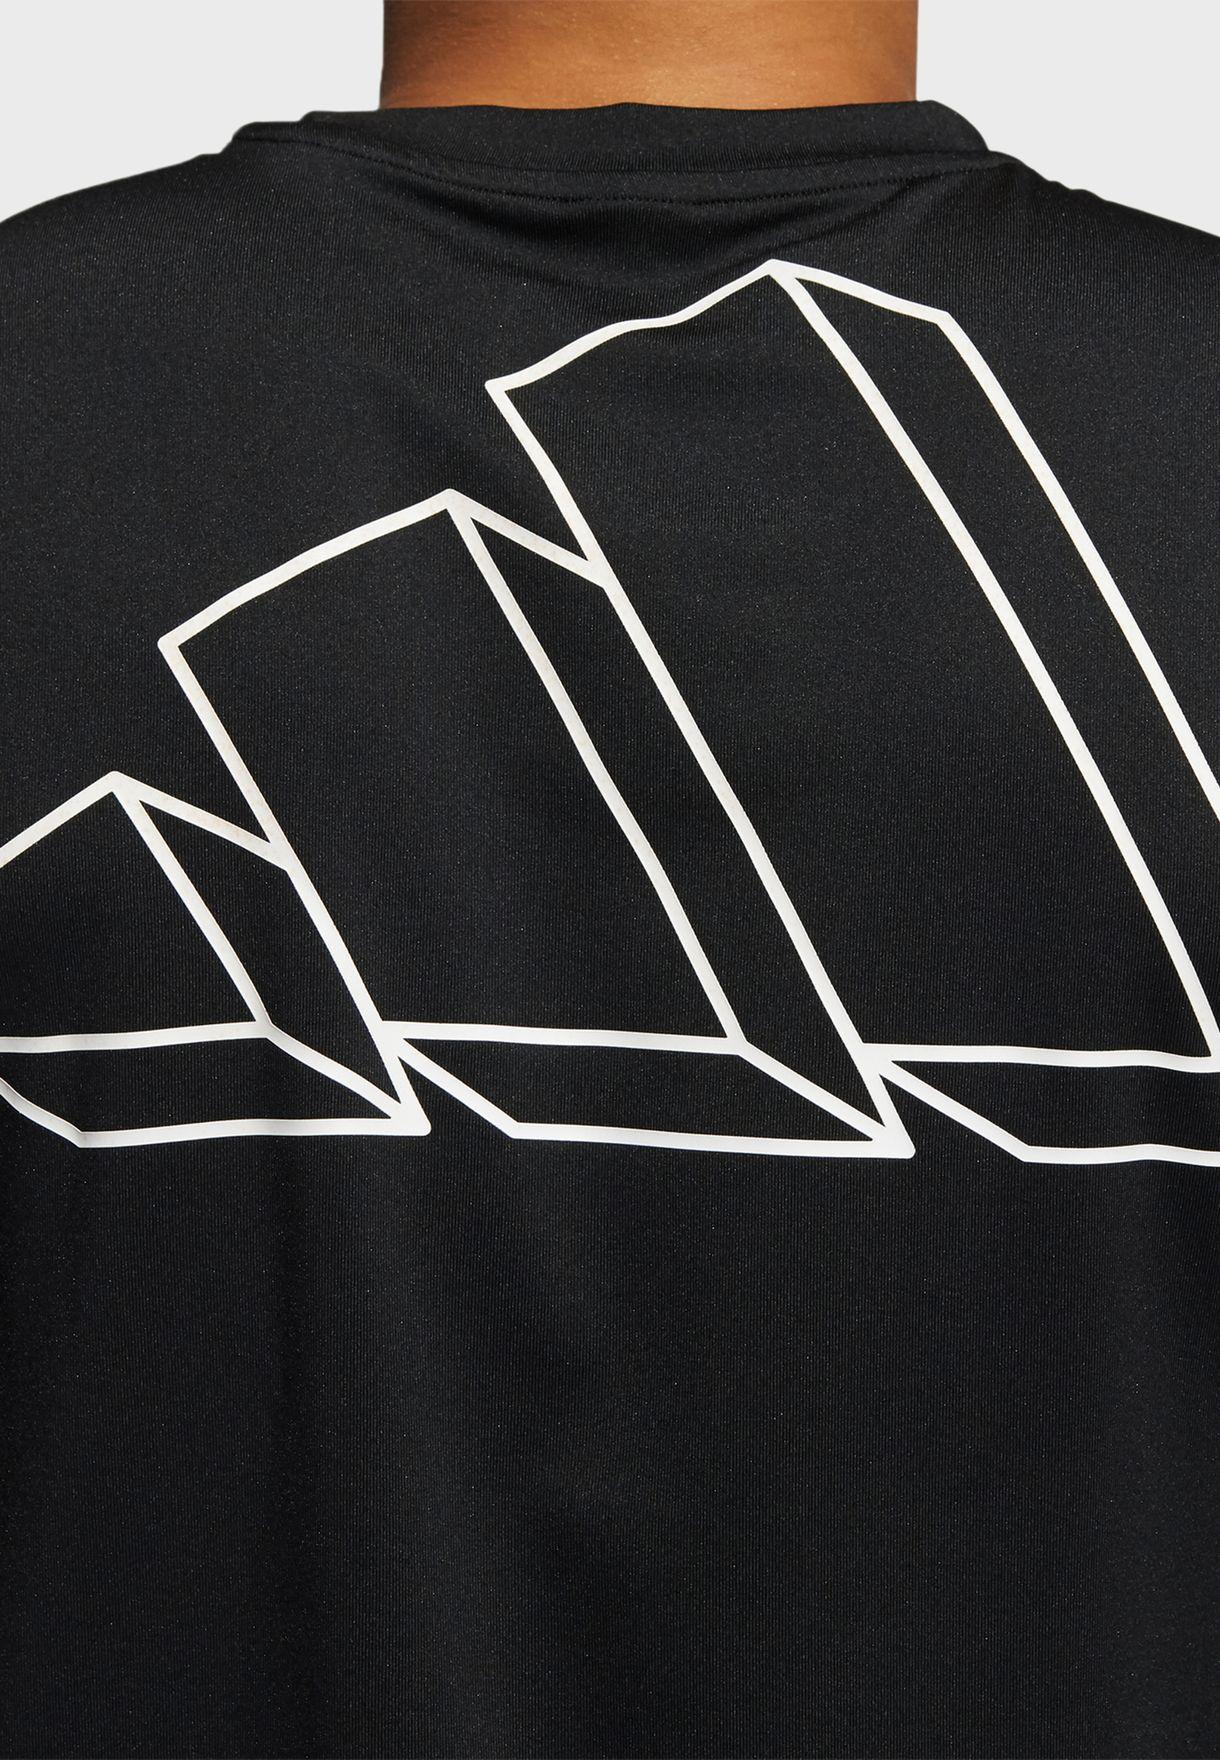 Fb Hype T-Shirt